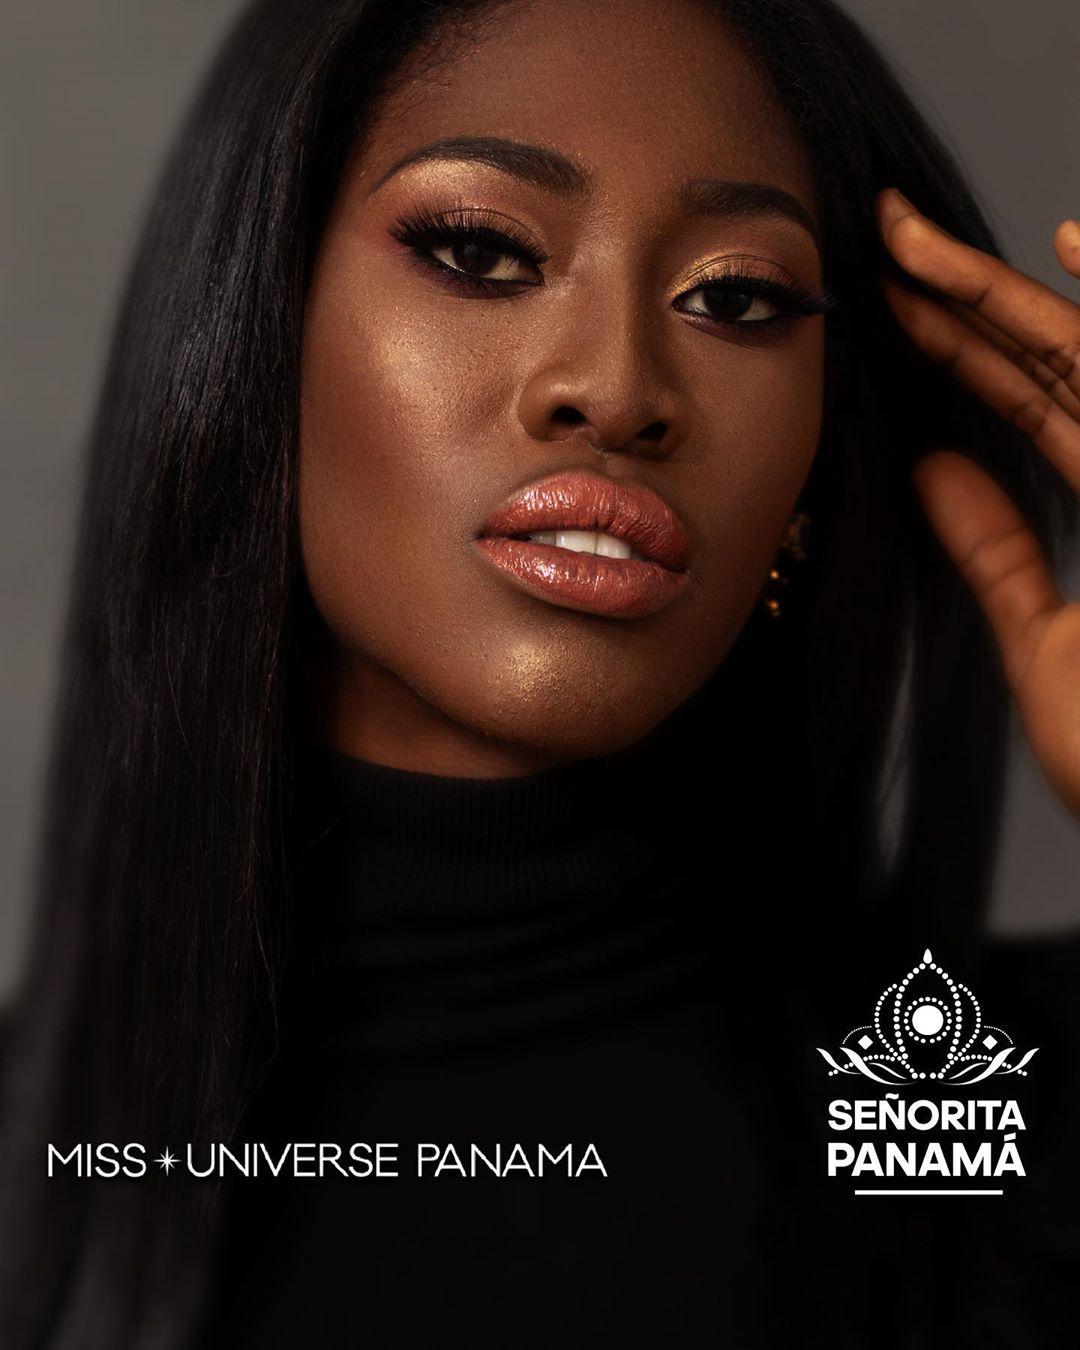 candidatas a senorita panama 2020. final: 16 may. IiGjtW